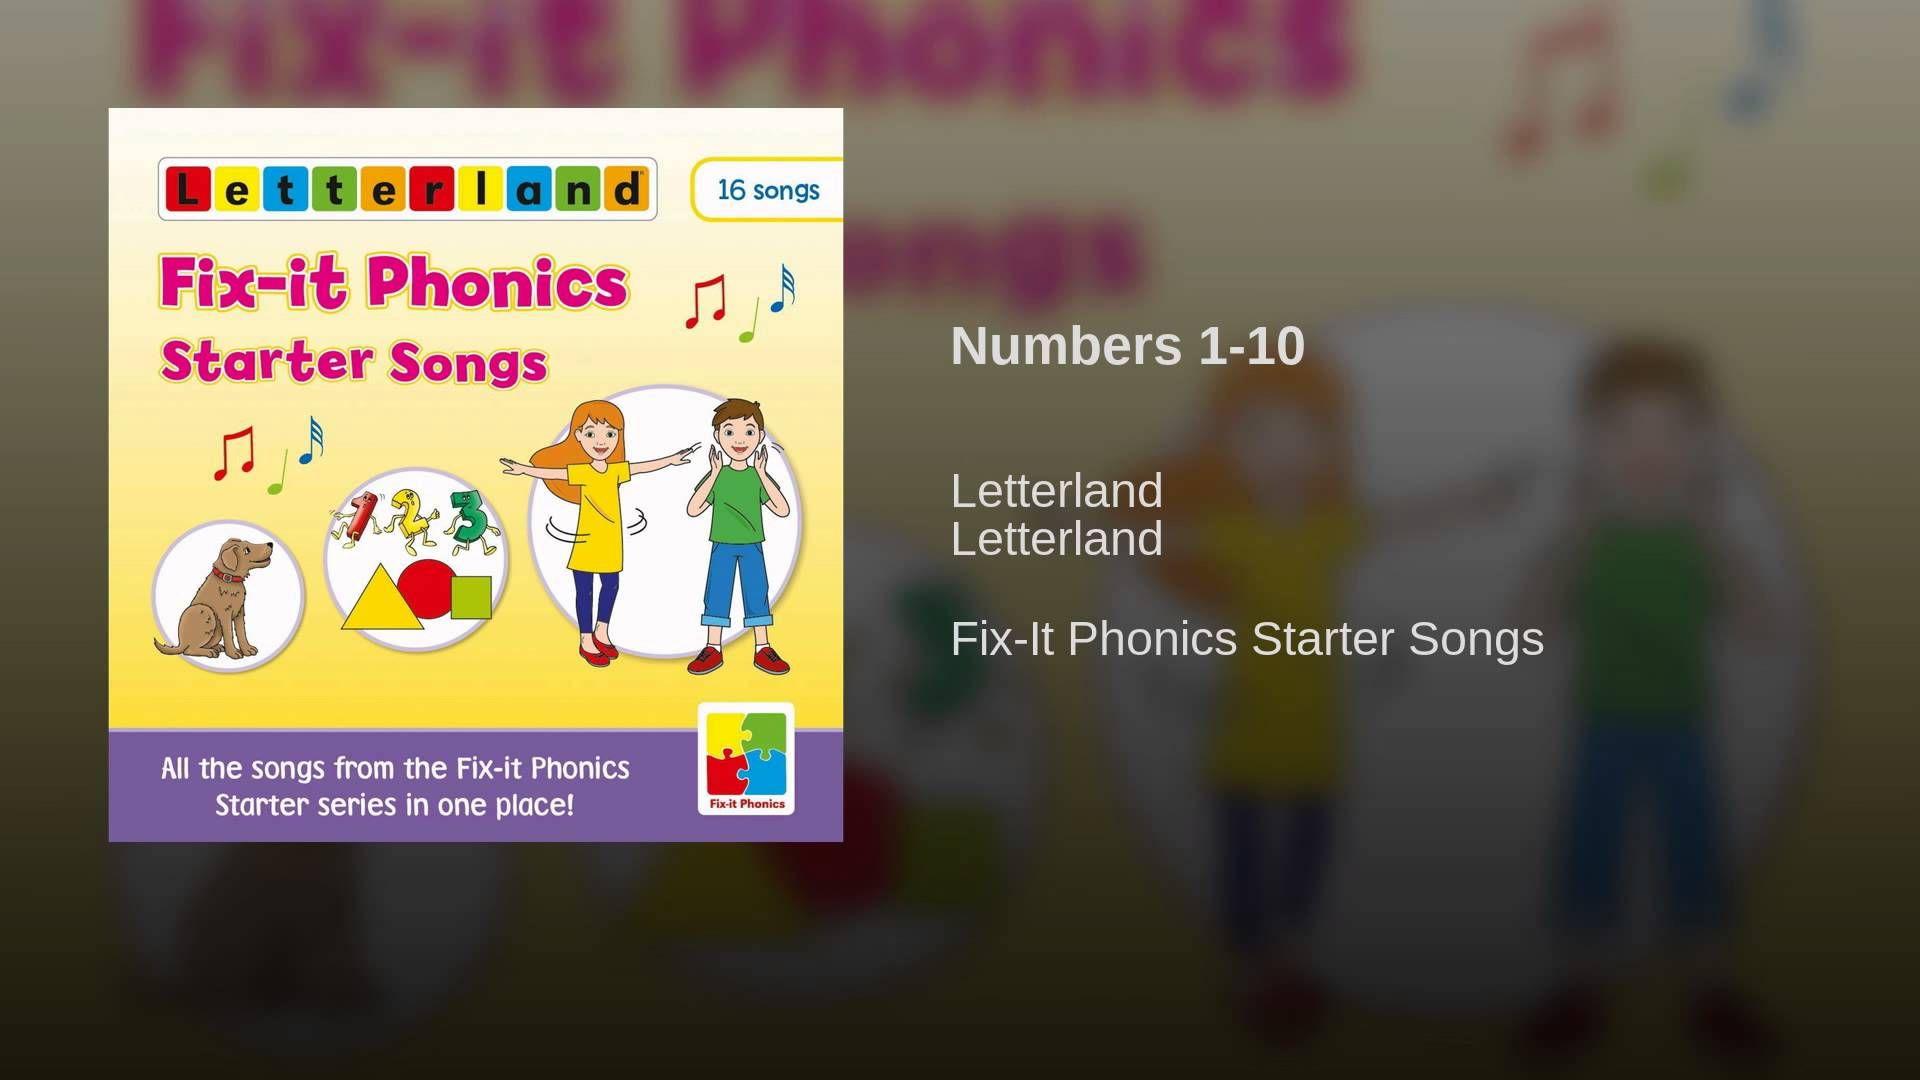 Numbers 1-10 | Numbers 1 10, Phonics, 10 things